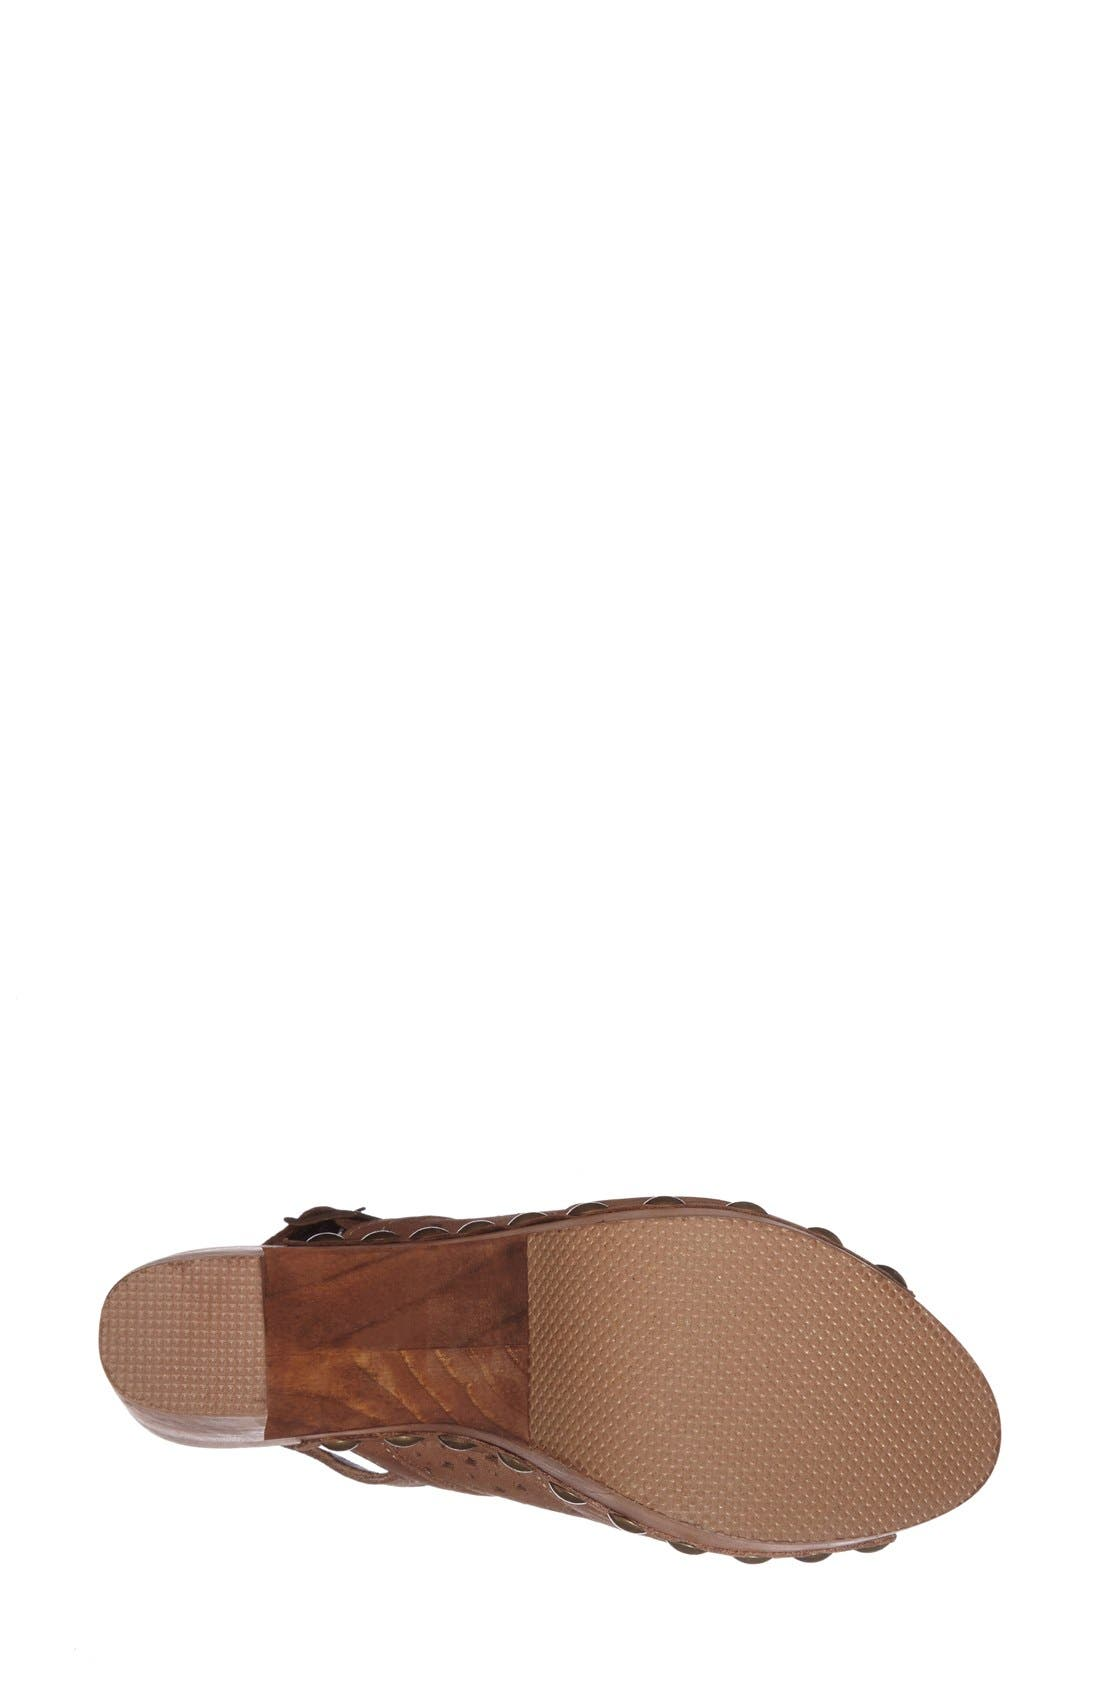 Alternate Image 4  - five worlds by Cordani 'Tampico' Platform Sandal (Women)